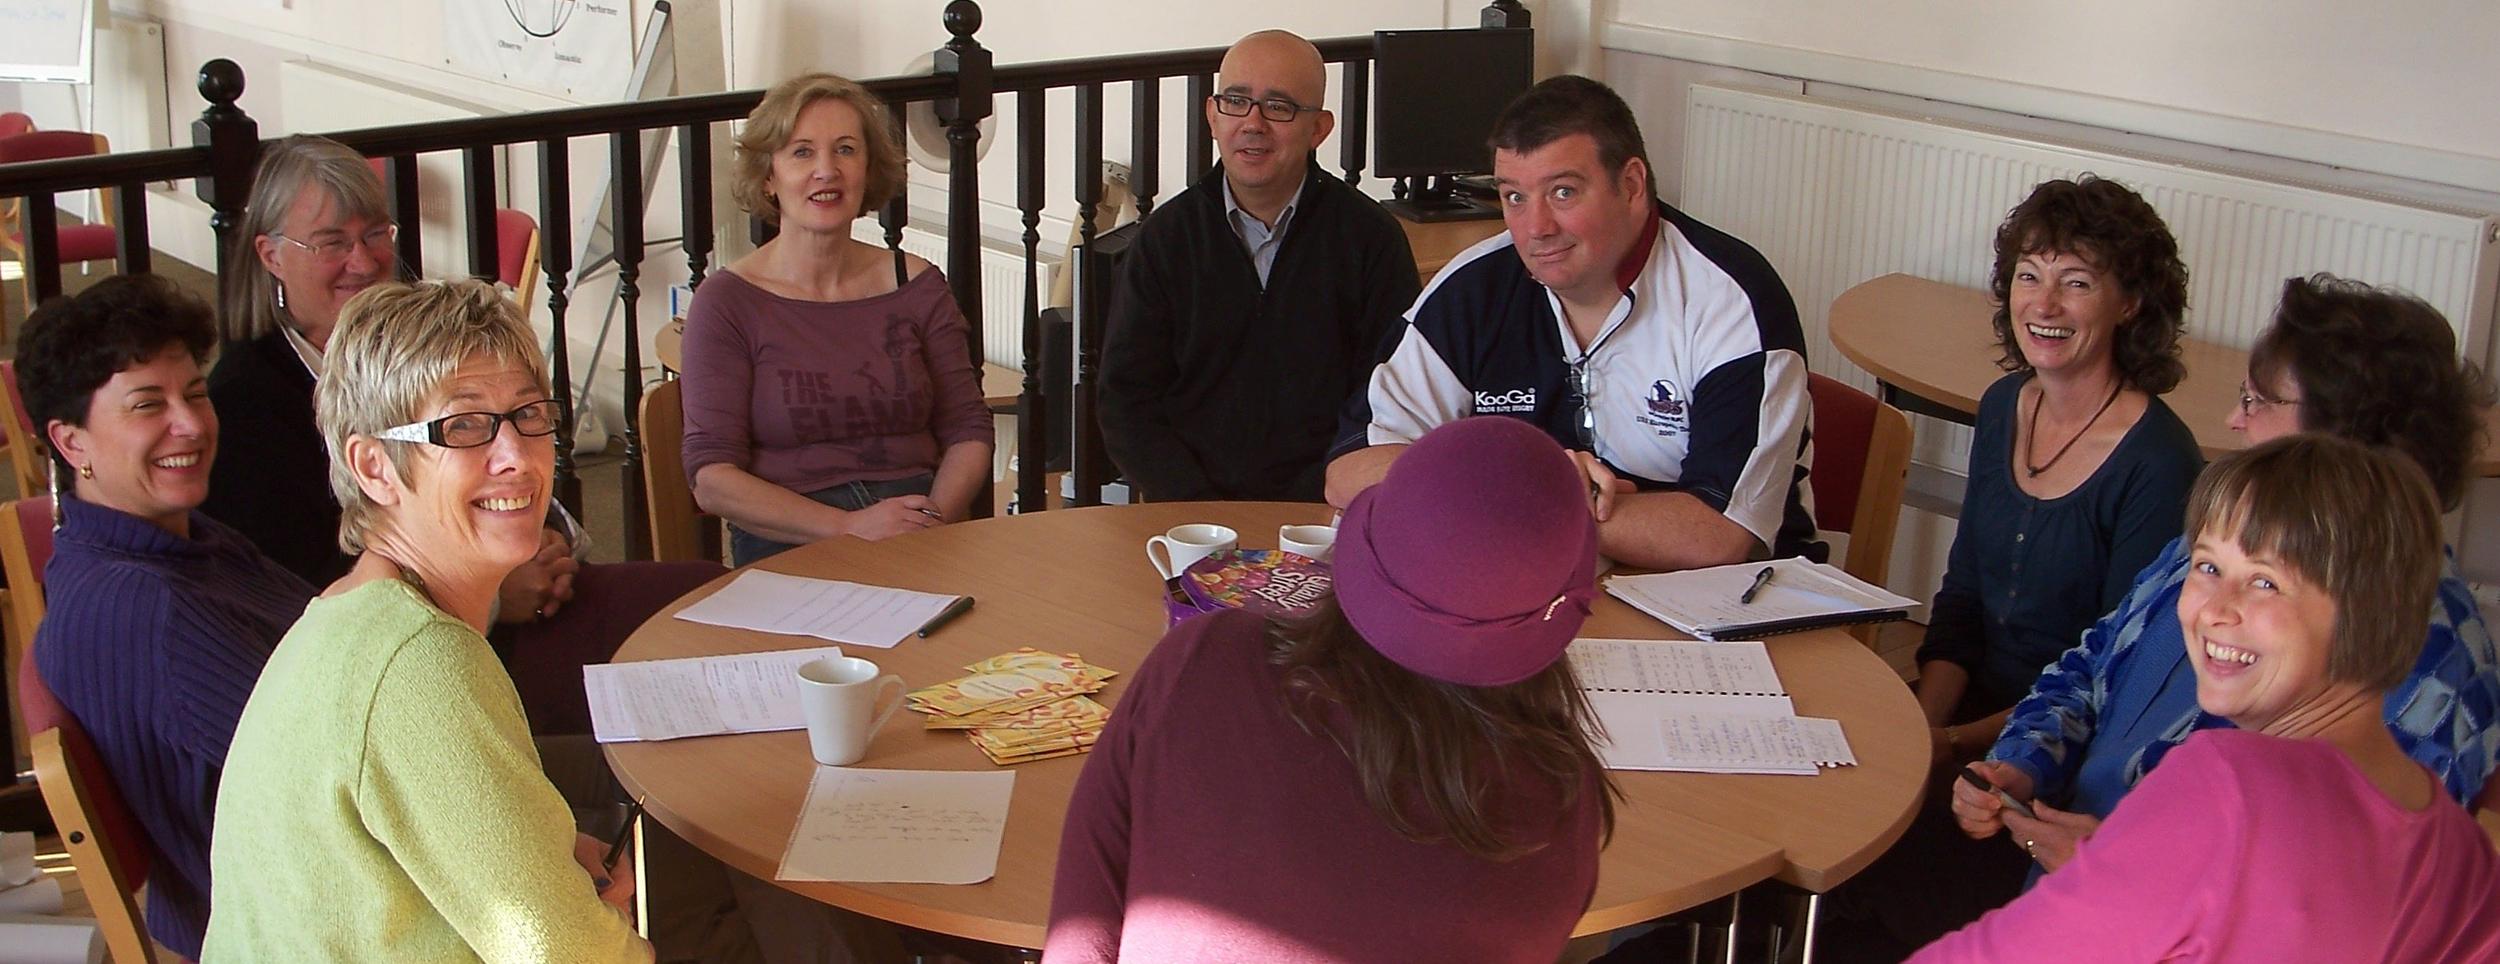 Participants in Bristol Enneagram Professional Training Program.